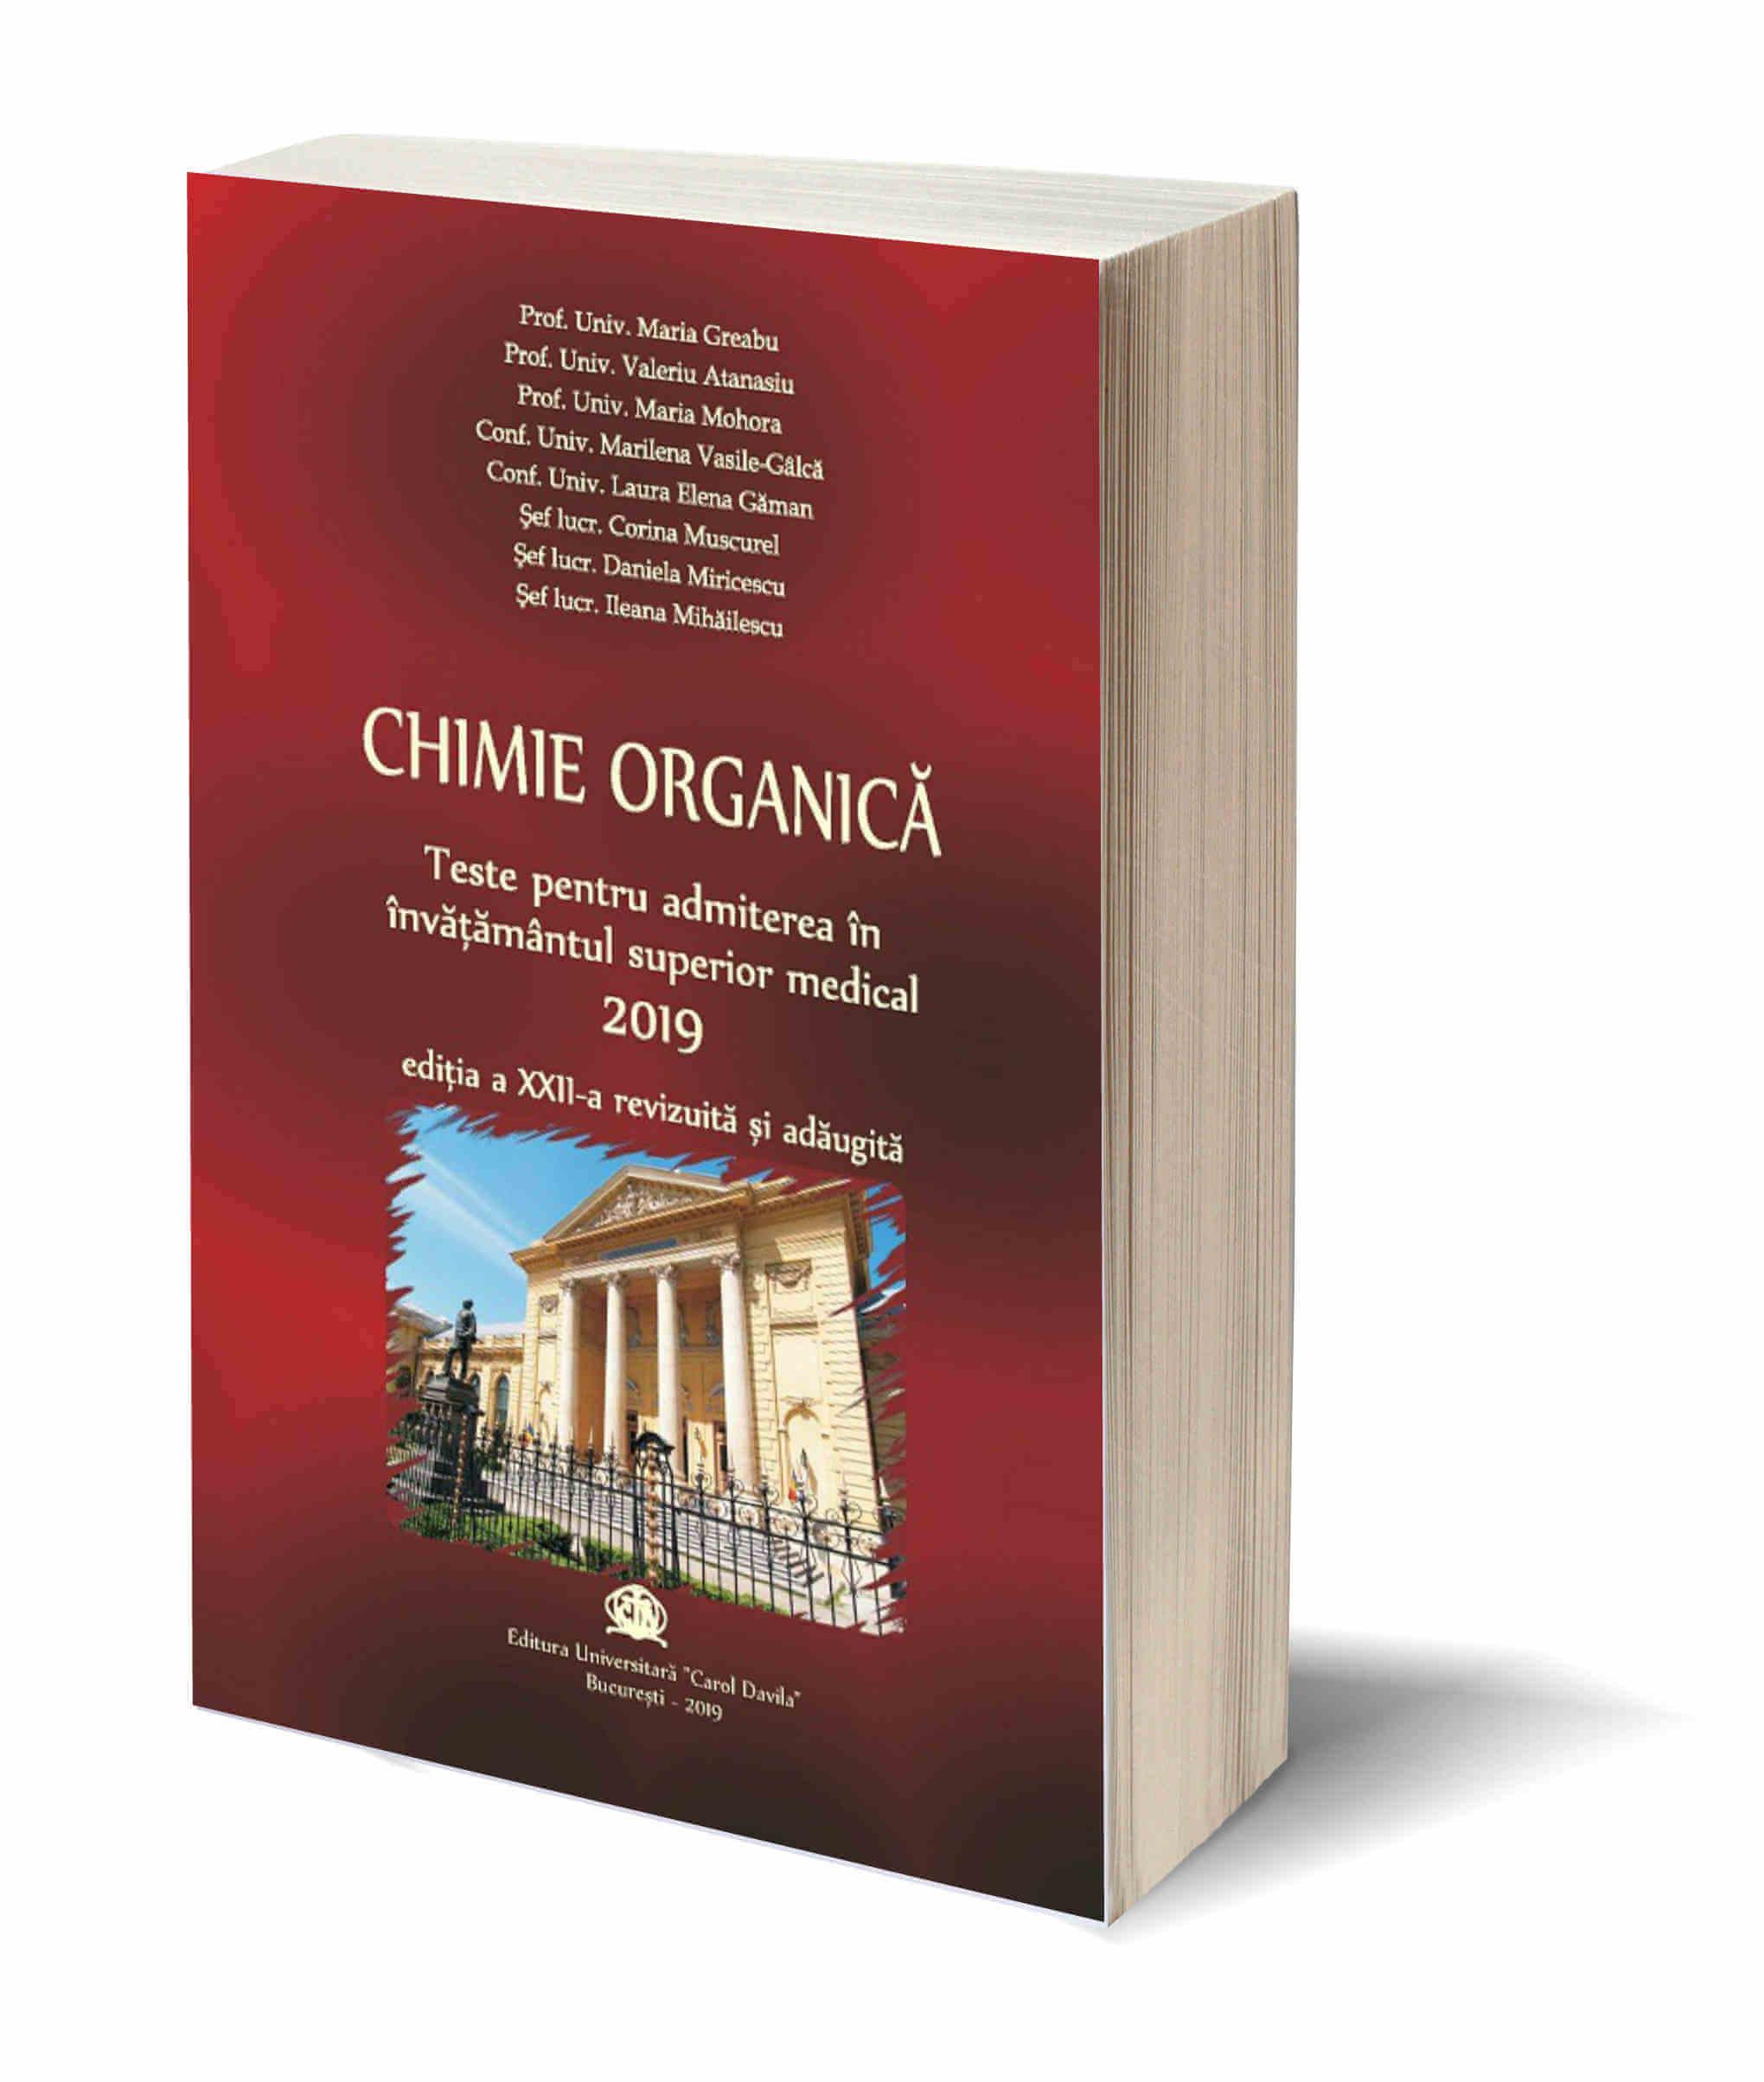 Chimie Organica – Teste pentru admiterea in invatamantul superior medical 2019